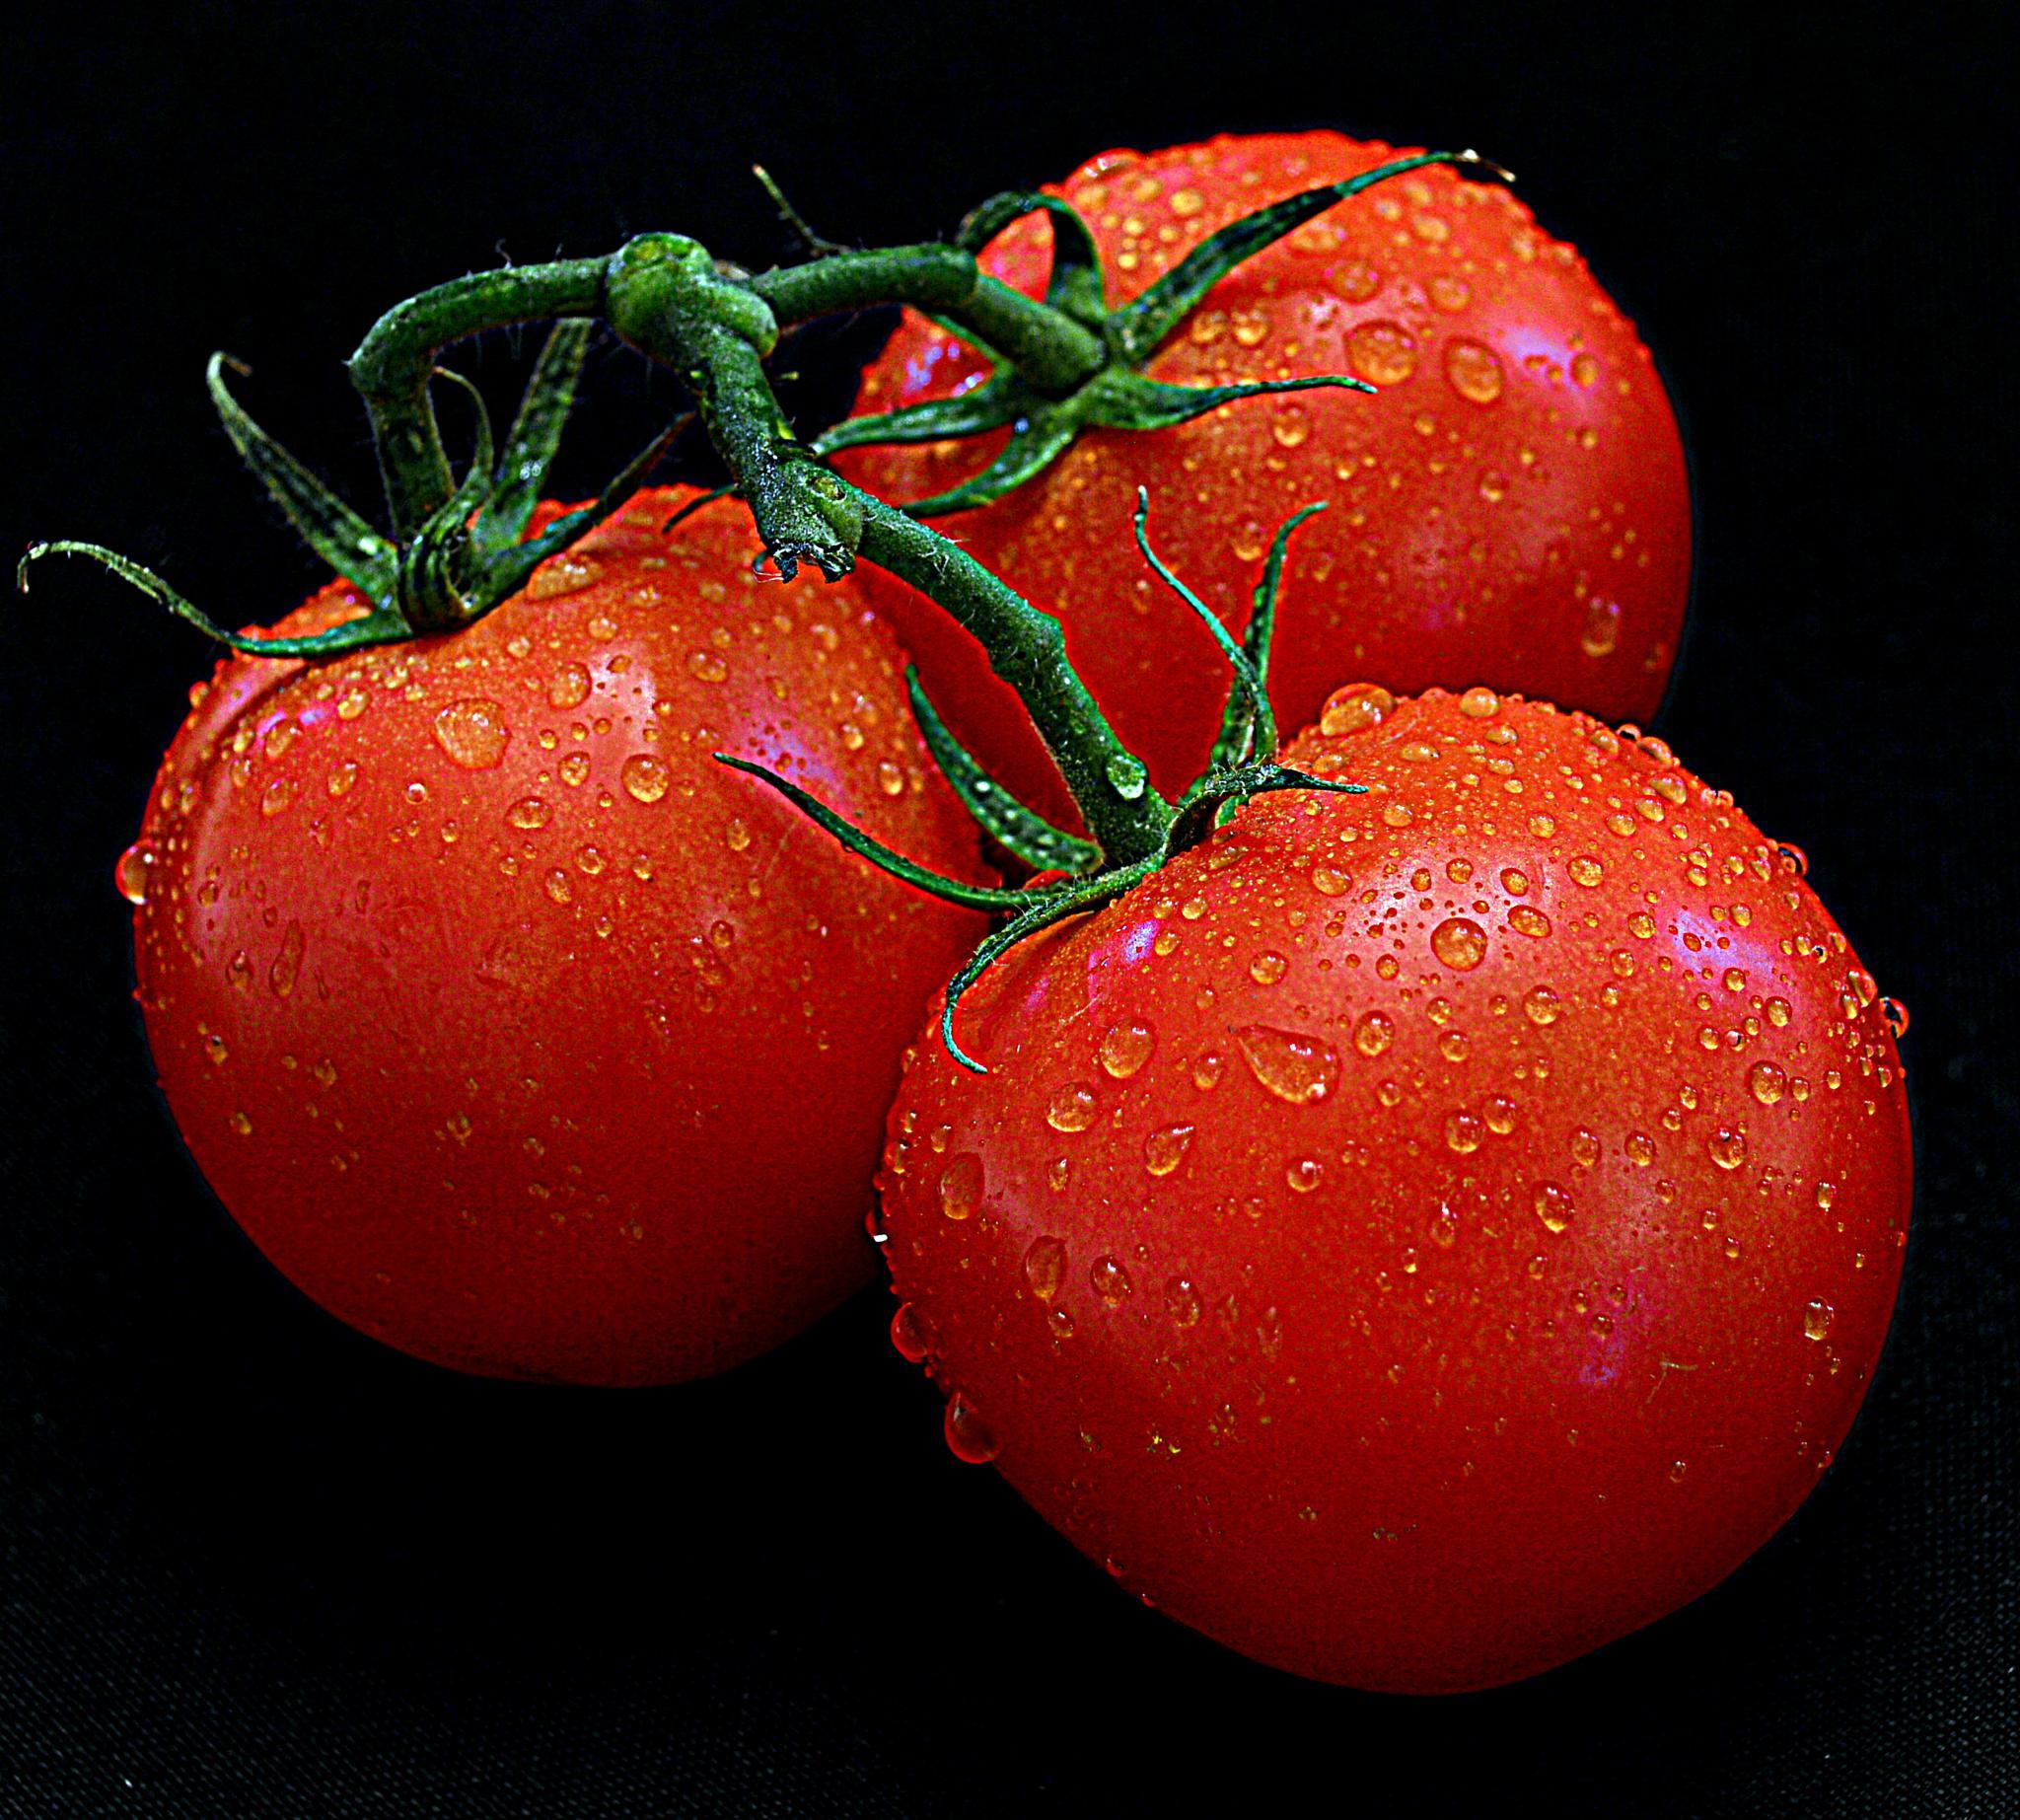 Tri tomatos by Andrew Piekut